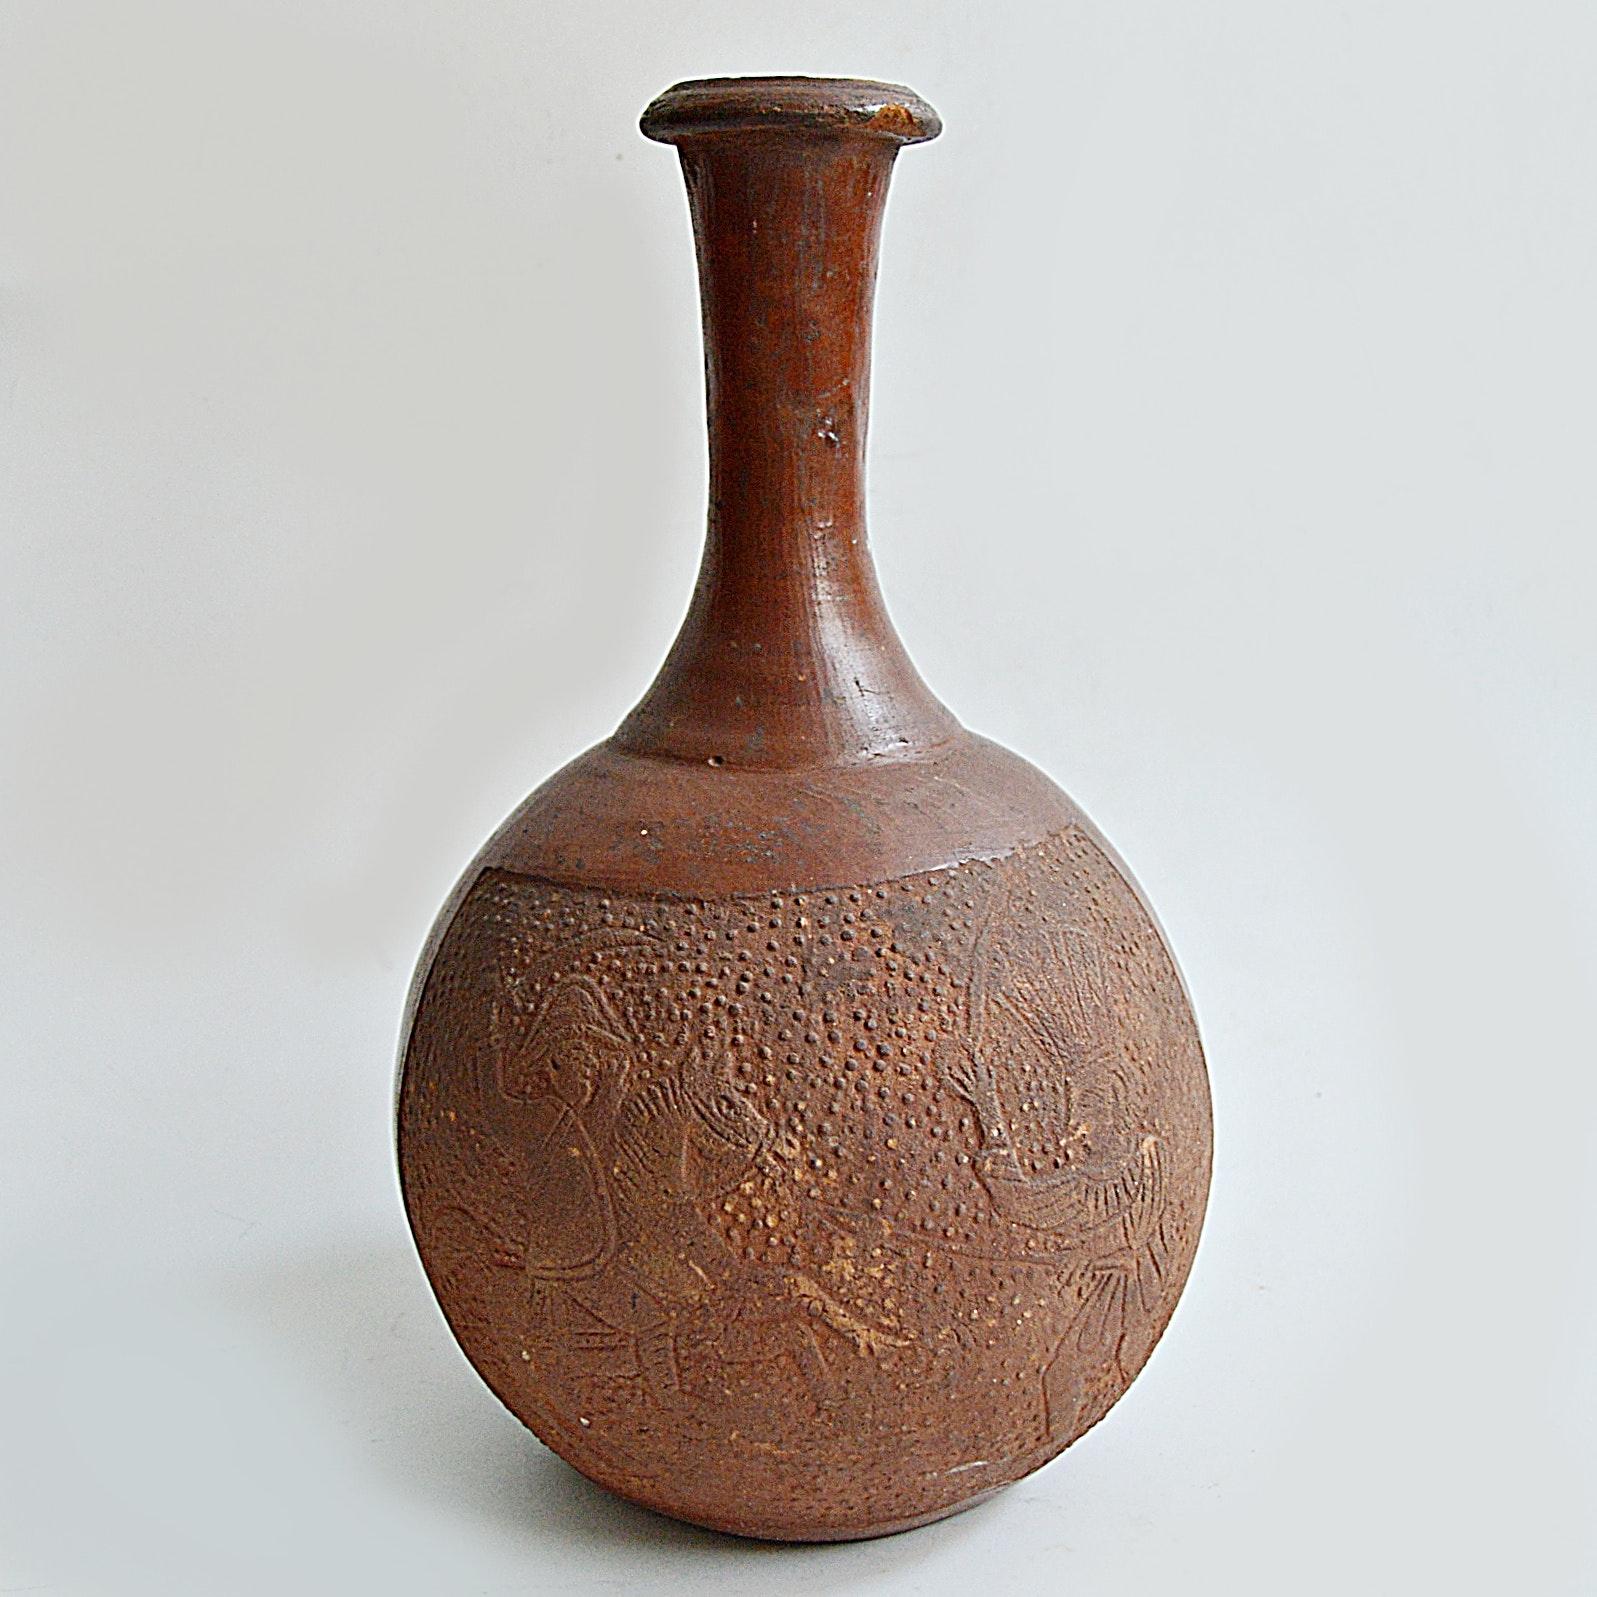 Late 18th-Early 19th Century Mesoamerican Terra Cotta Folk Art Vase